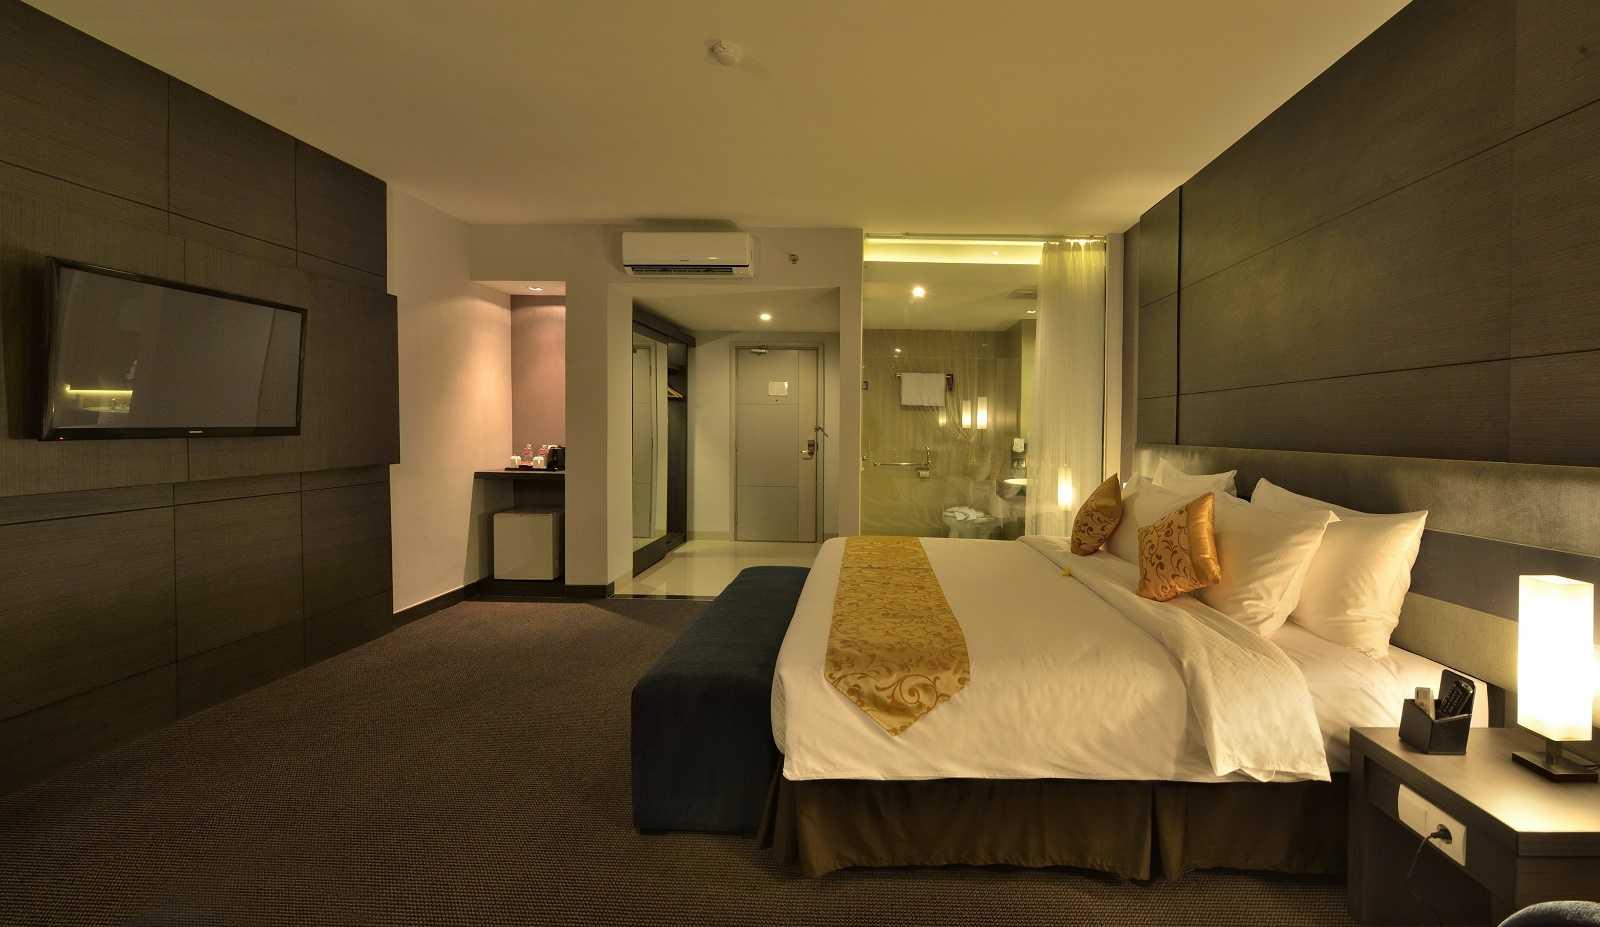 Melly Purnamahildha Tarman Grand Tjokro Pekanbaru Pekanbaru, Riau, Indonesia Pekanbaru, Riau, Indonesia Bedroom Modern  20457